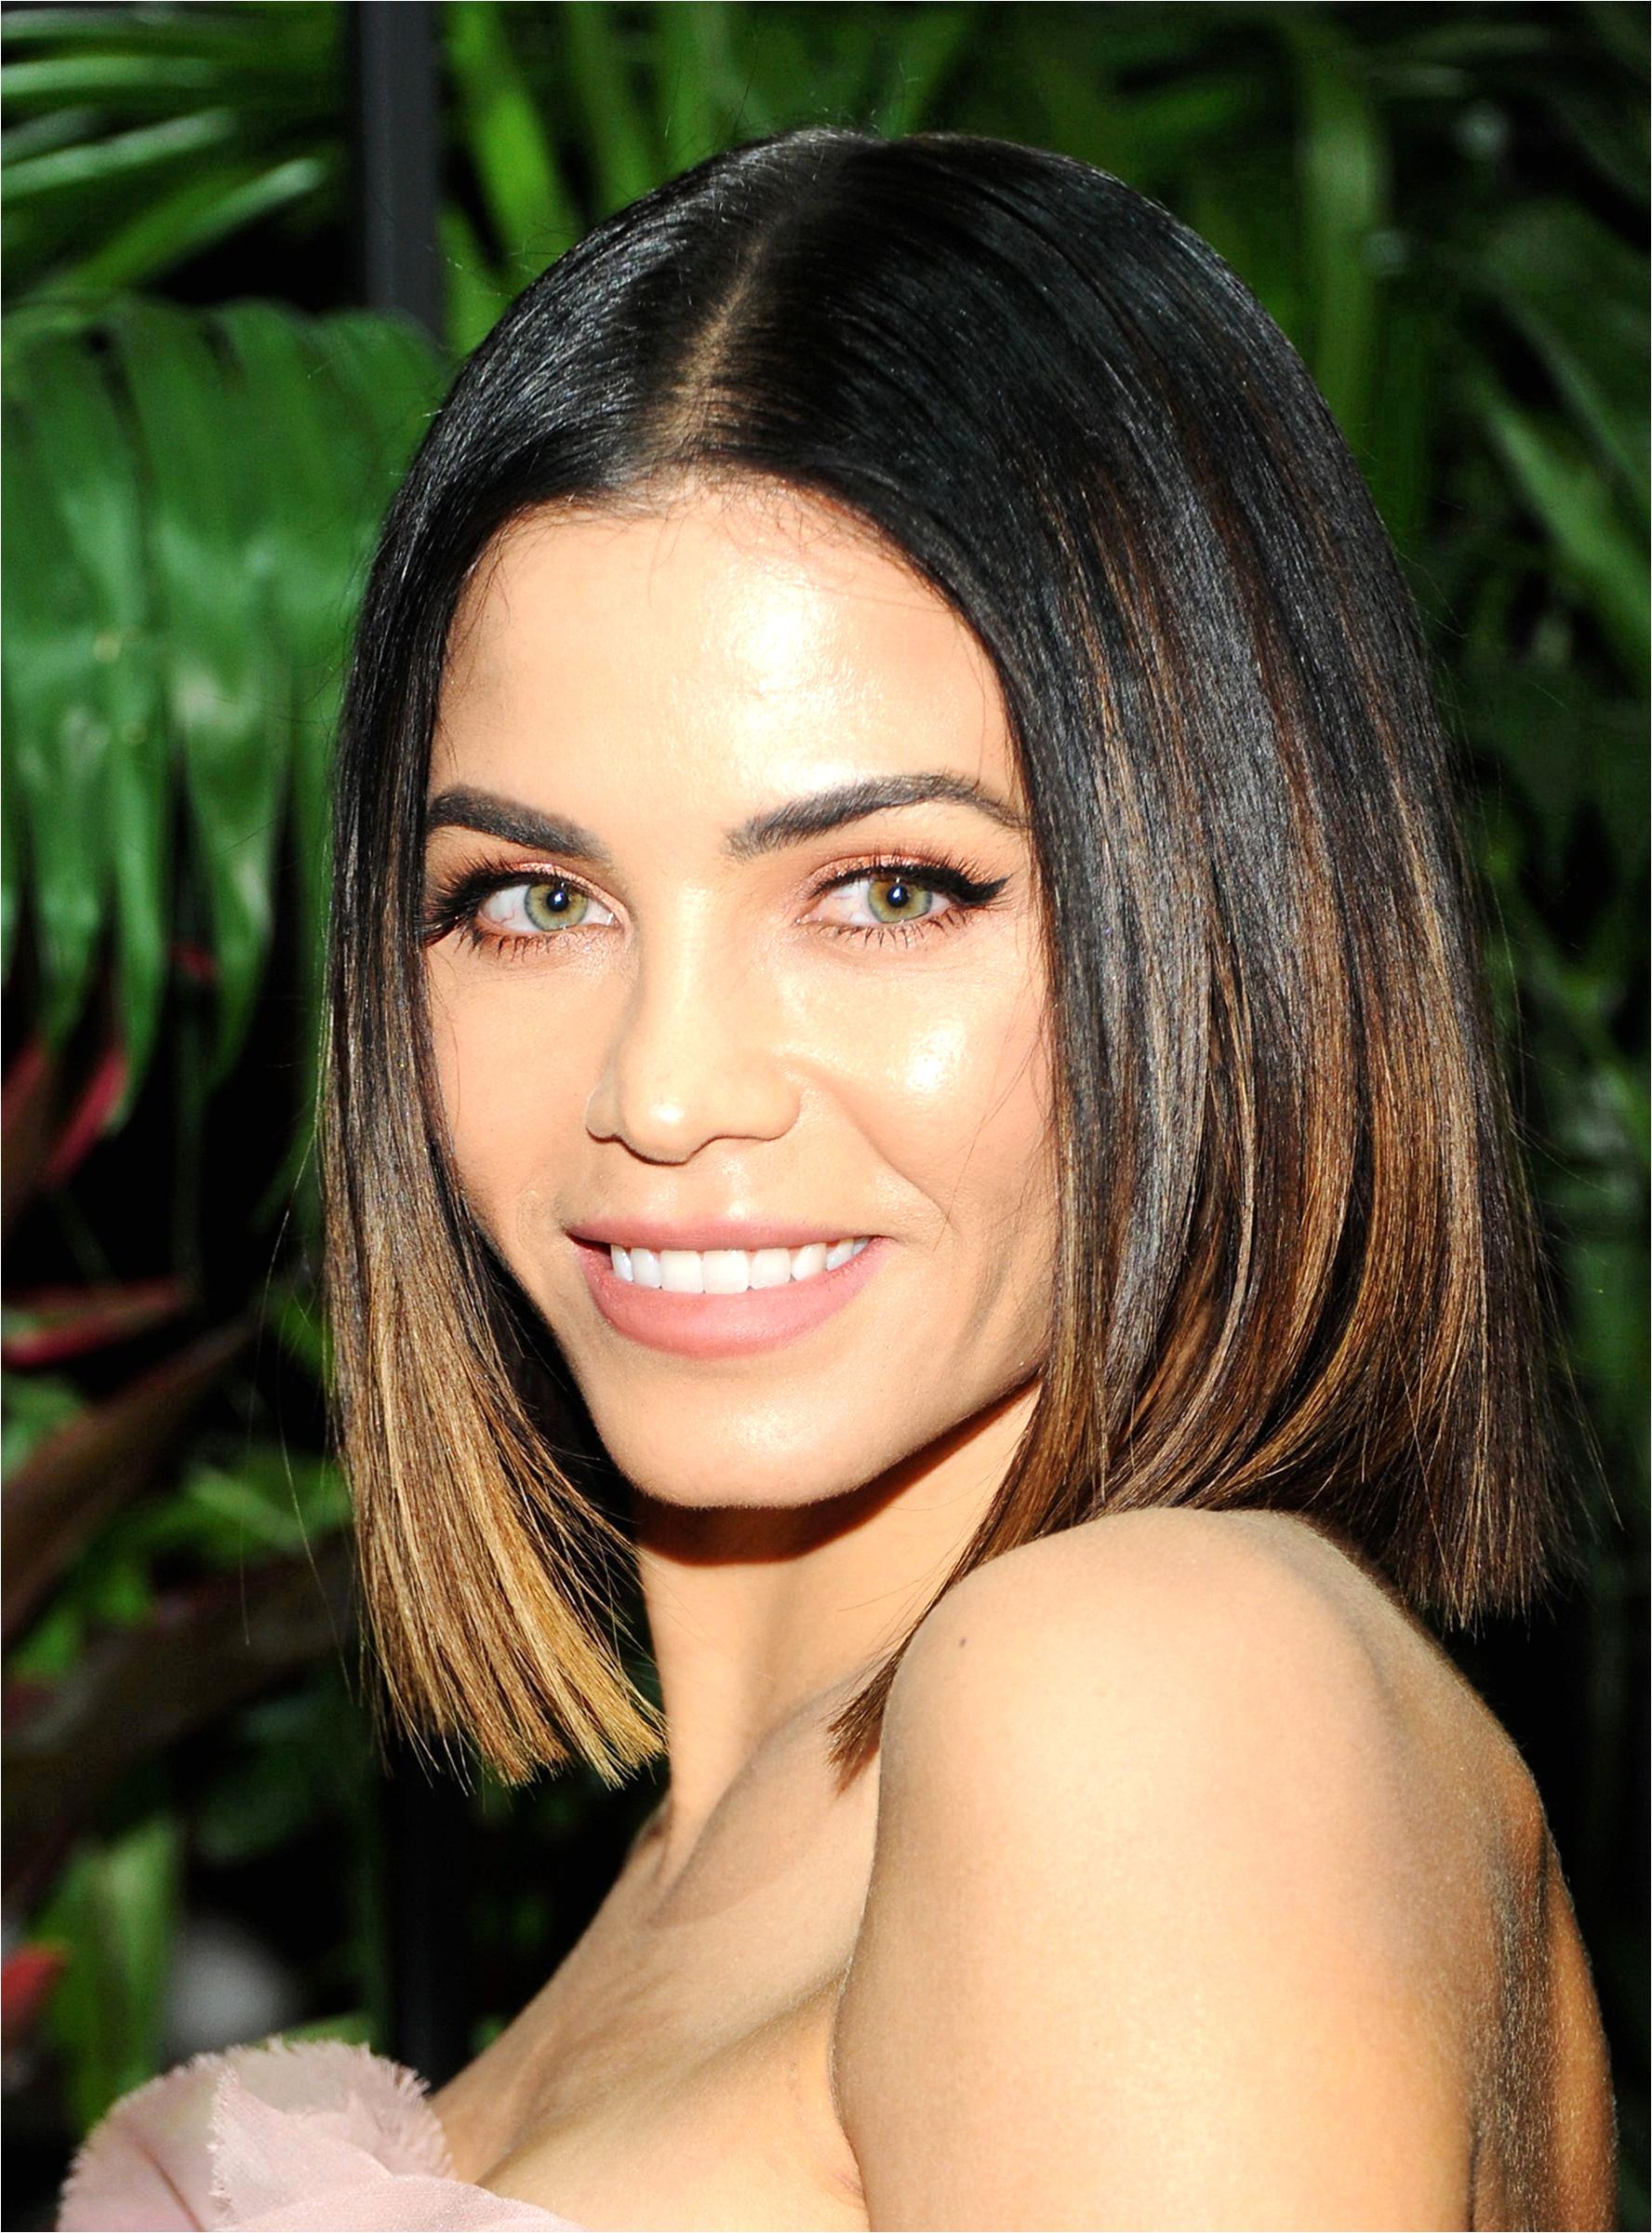 Shoulder Length Wavy Hairstyles Elegant Mocha Hair Tips toward Very Curly Hairstyles Fresh Curly Hair 0d